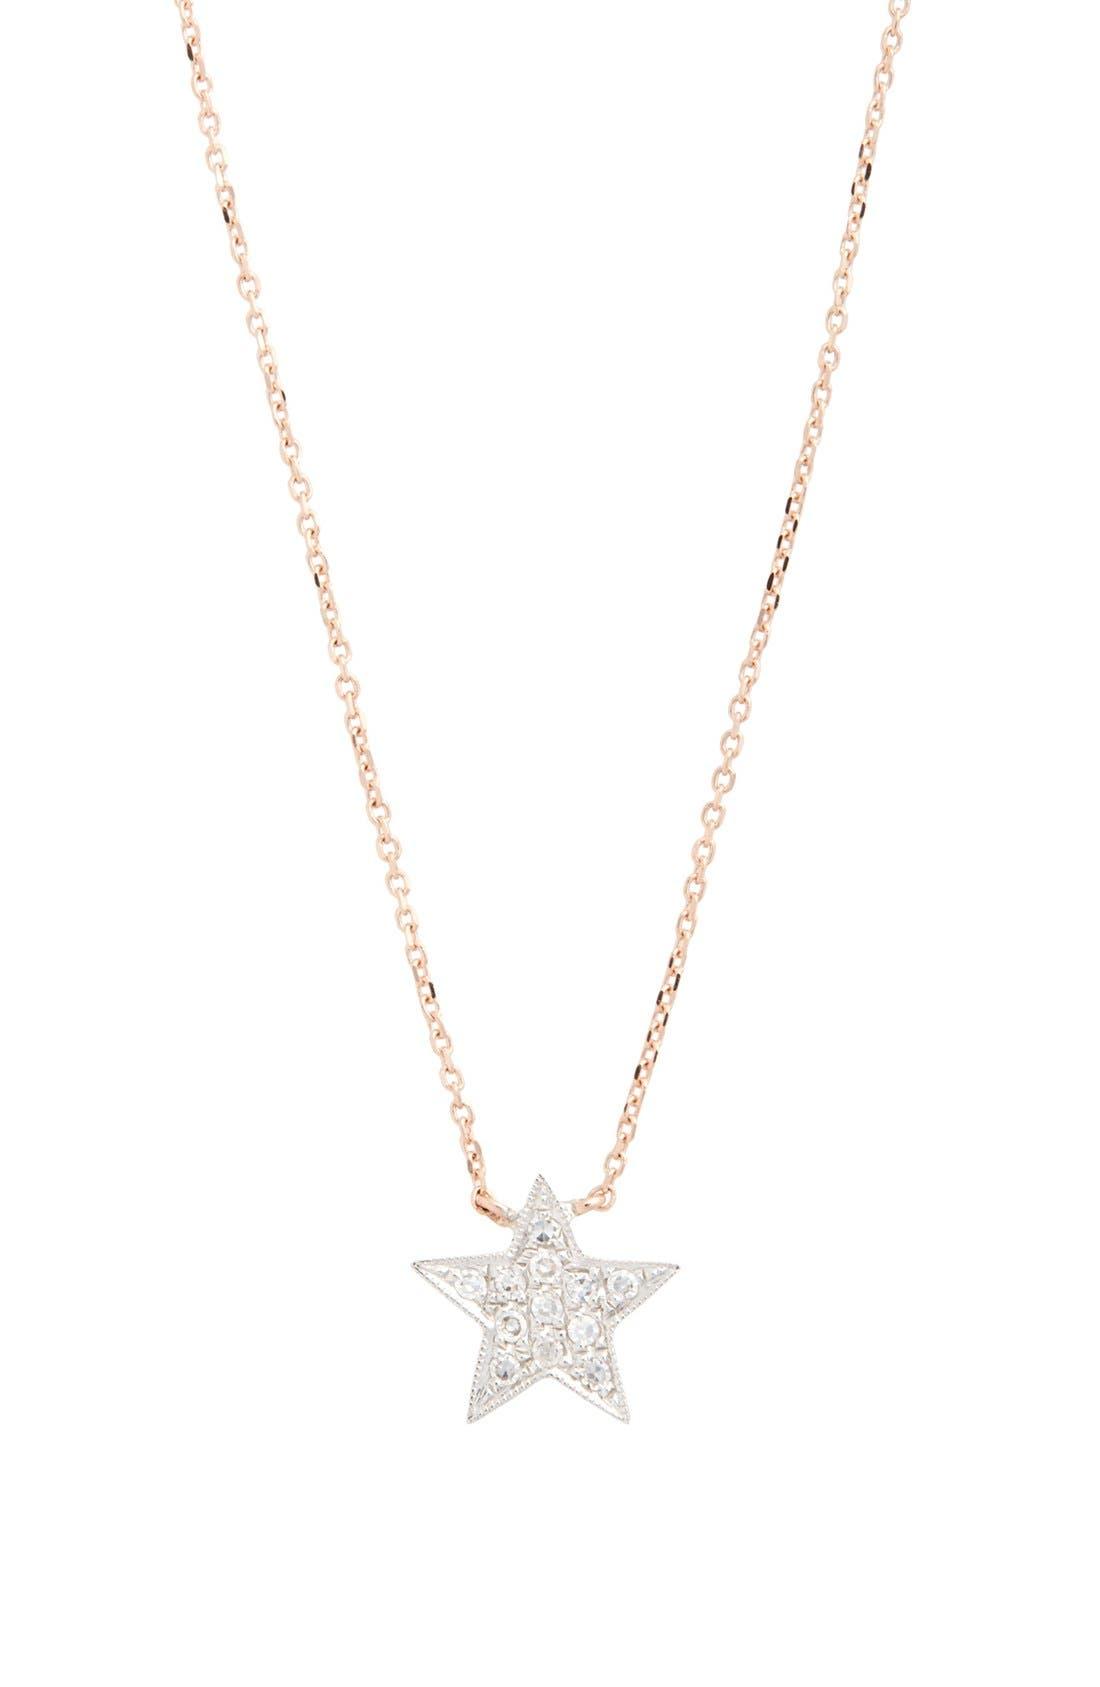 'Julianne Himiko' Diamond Star Pendant Necklace,                             Alternate thumbnail 3, color,                             Rose Gold/ White Gold